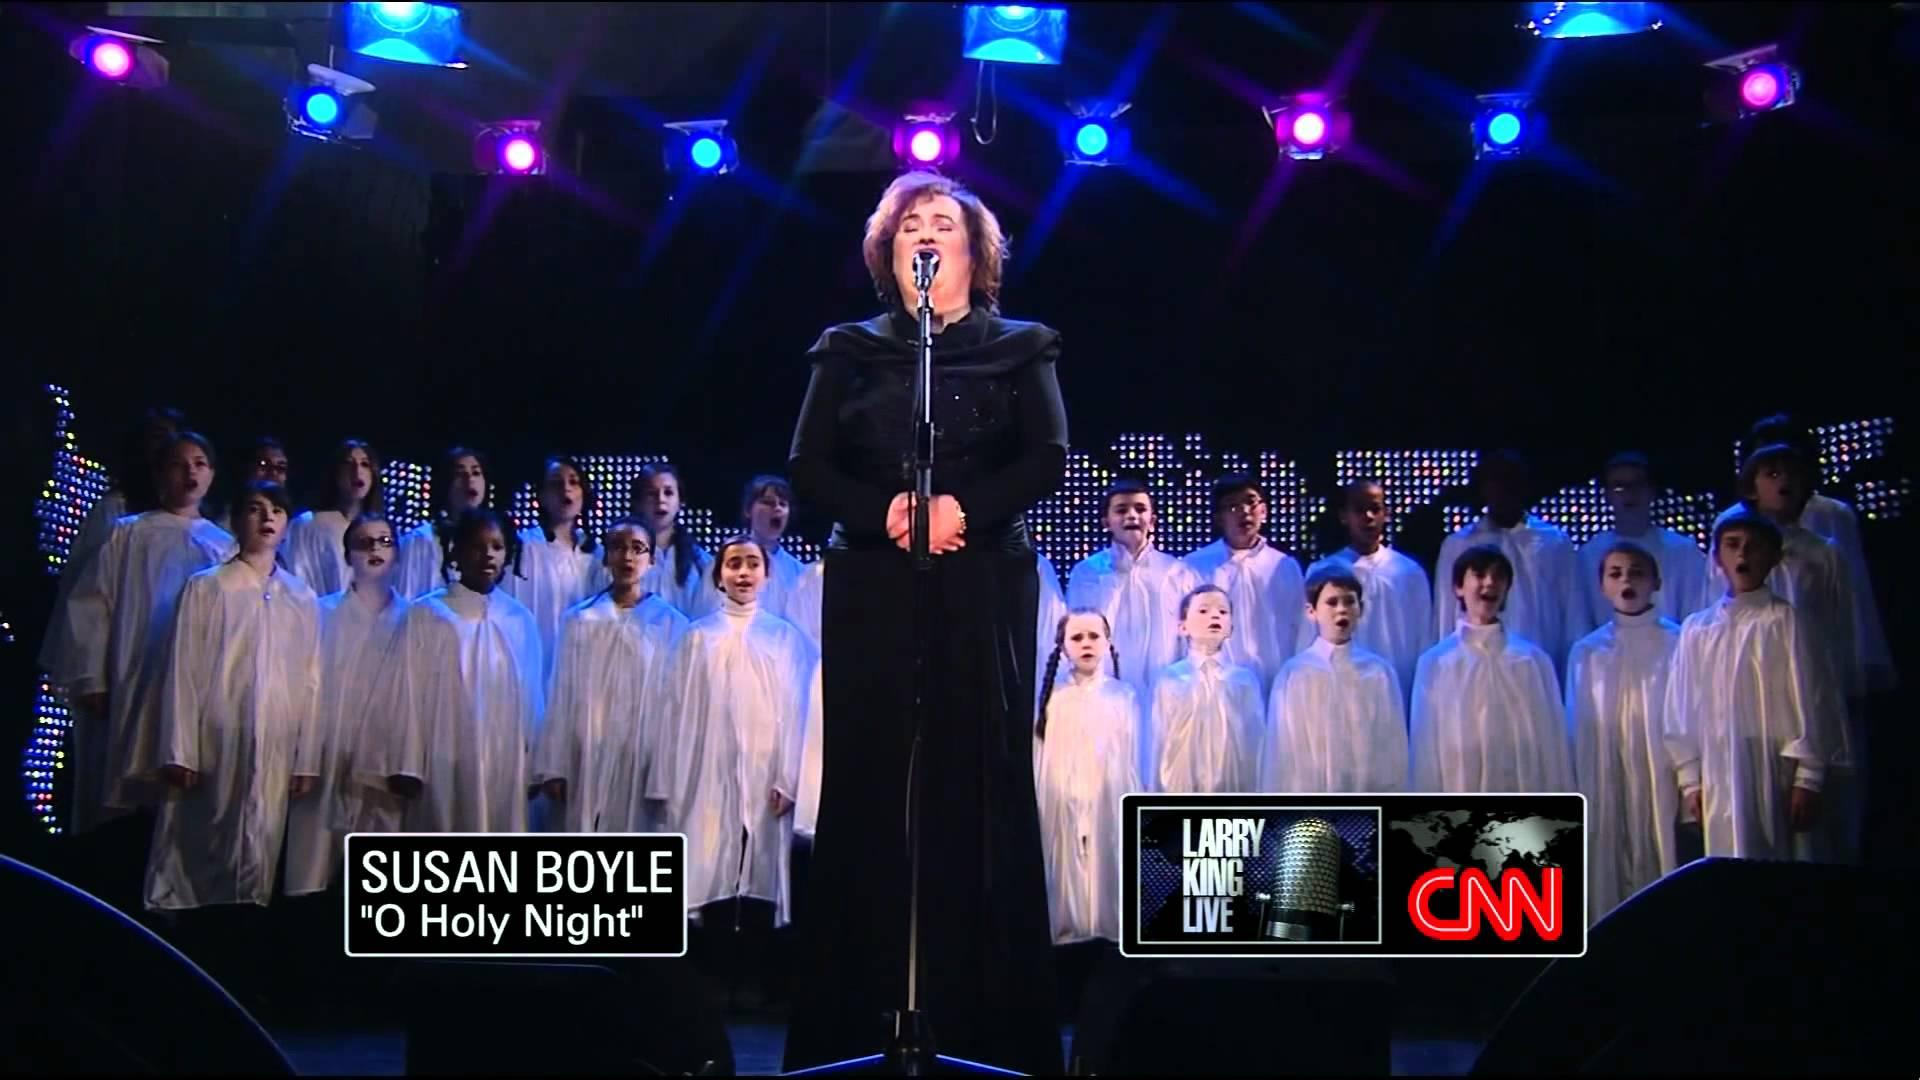 Susan Boyle - O Holy Night - Larry King LIve - December 2010